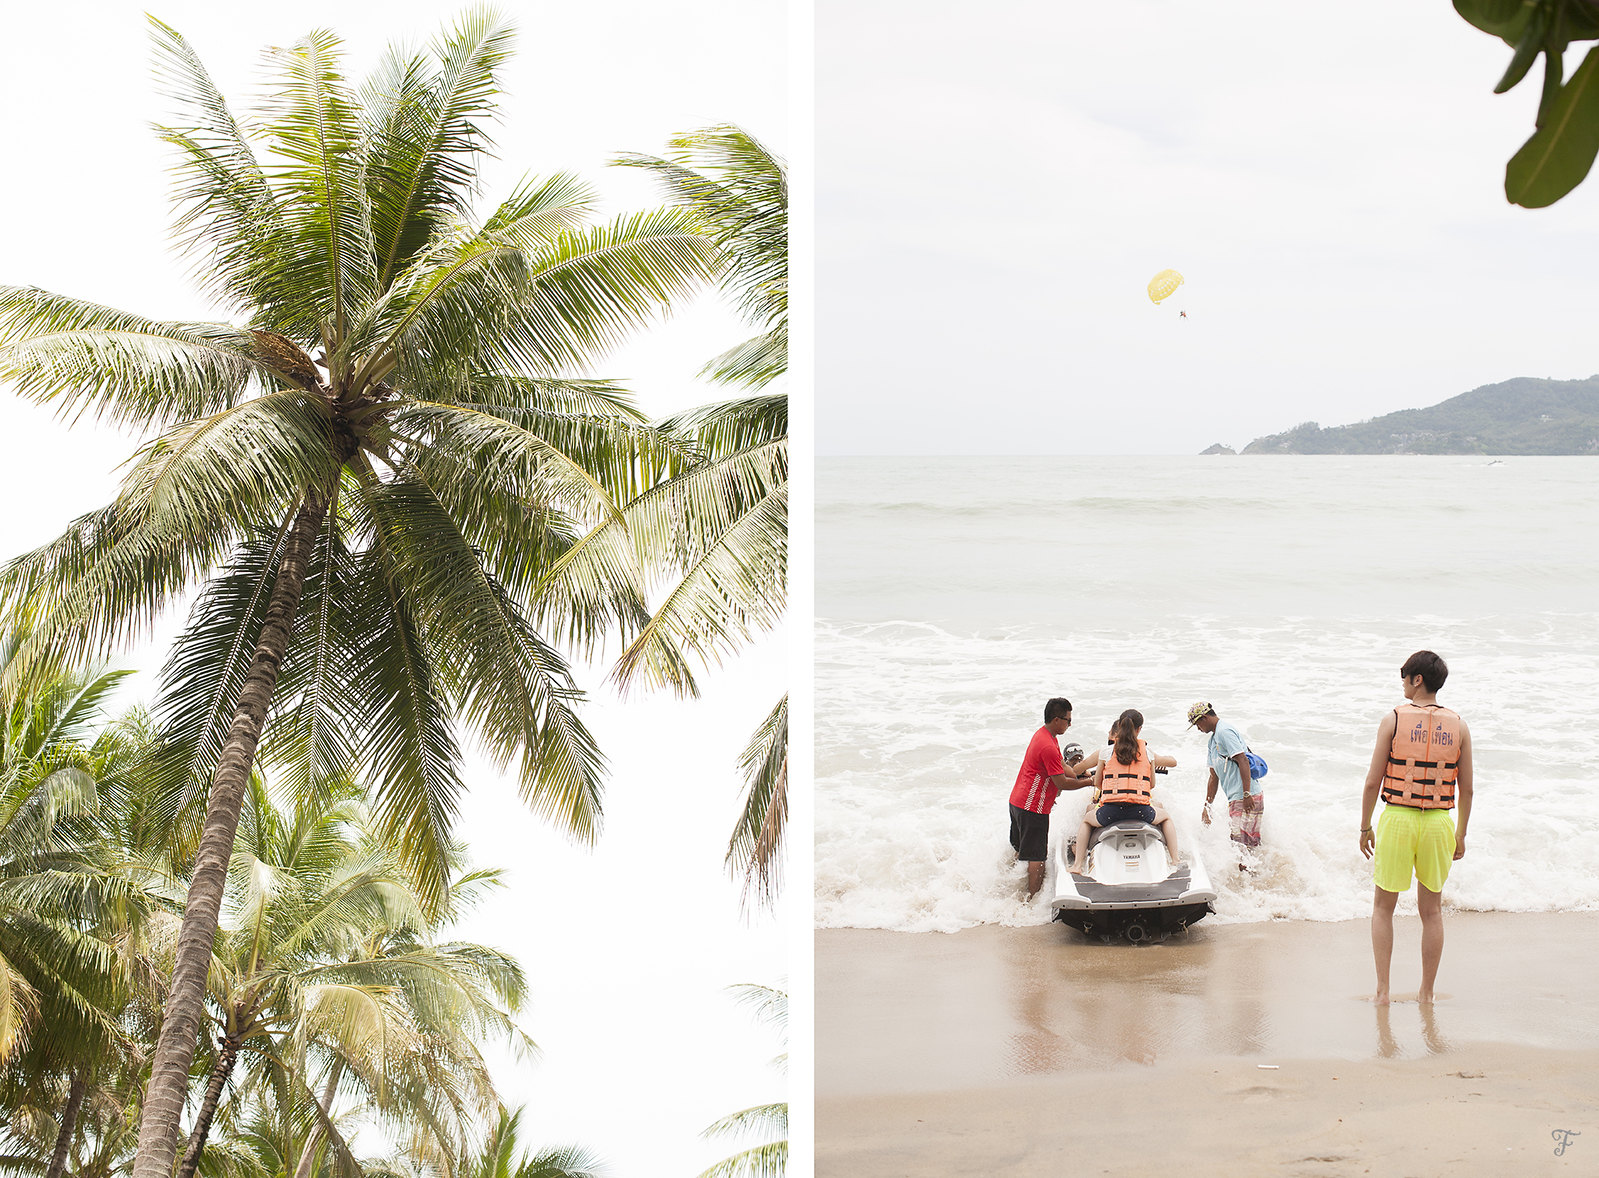 phuket thailand dust thani resort 2015